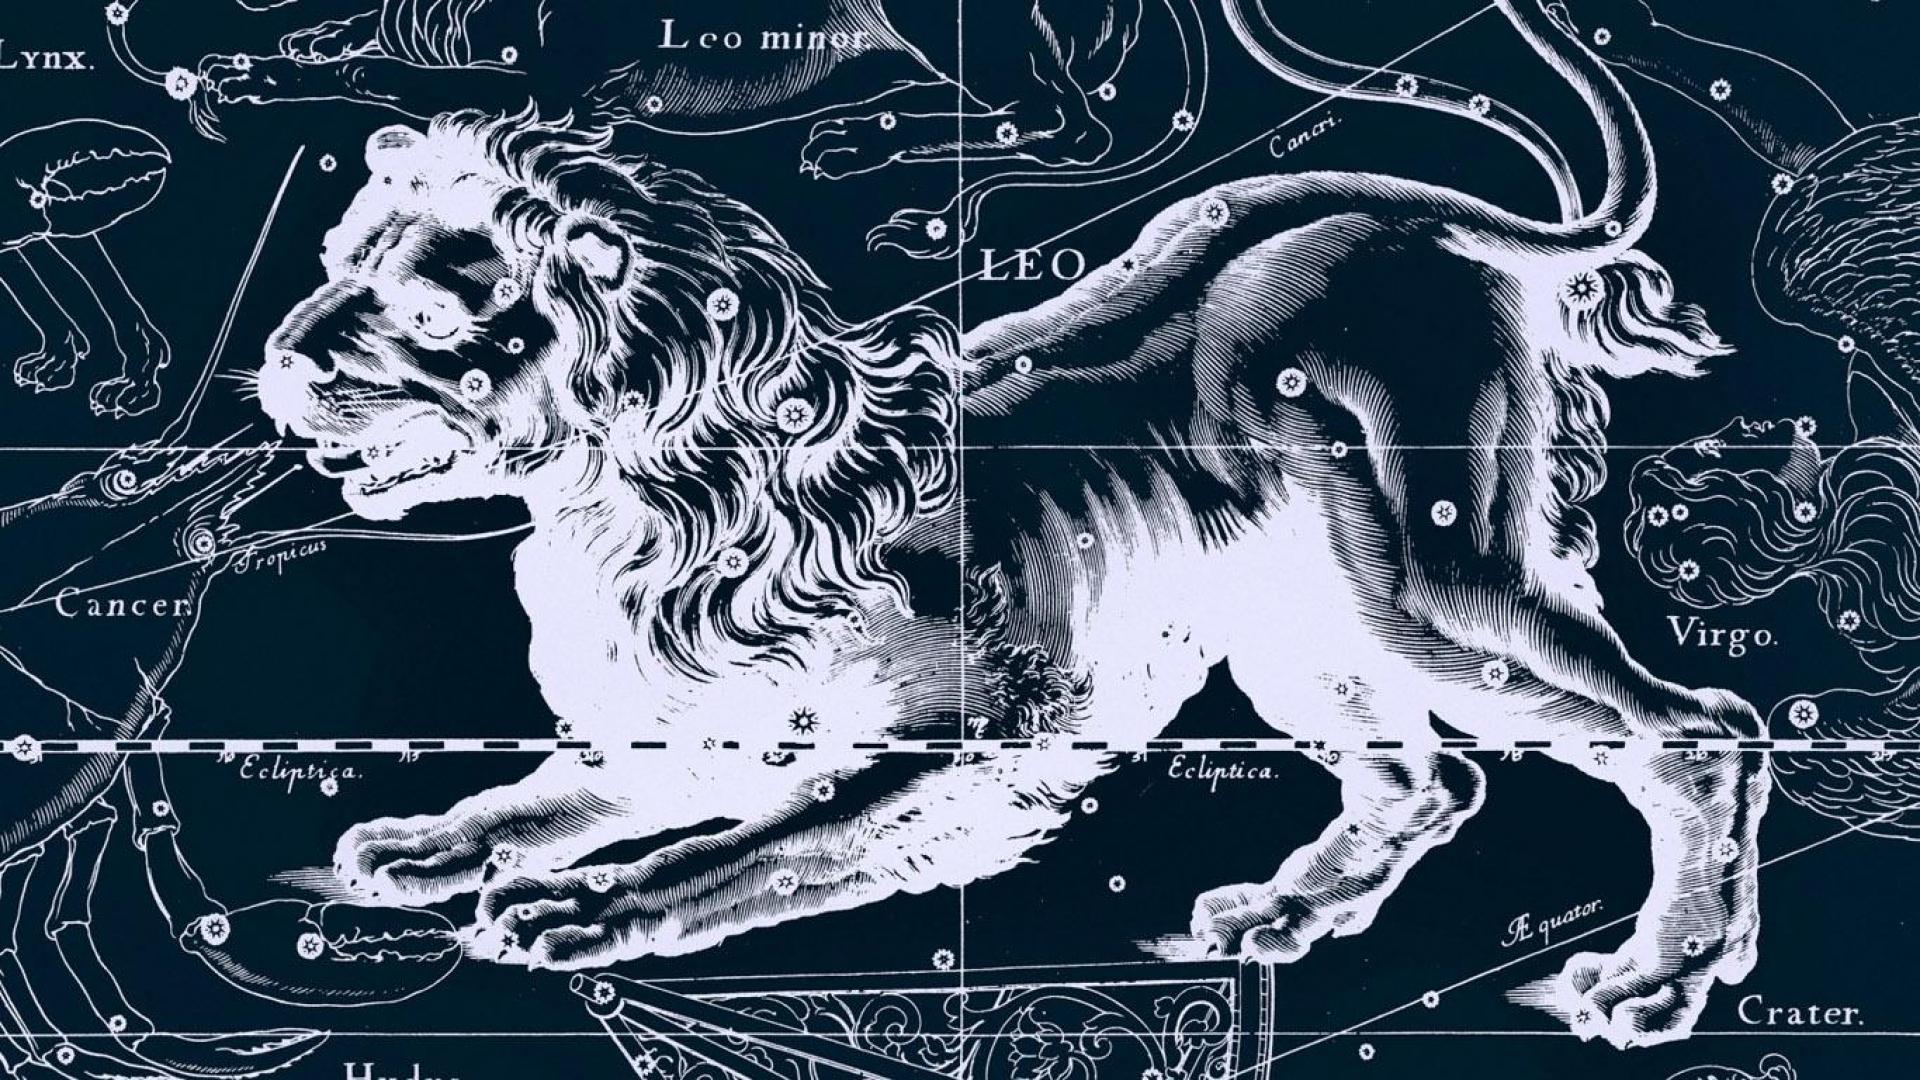 Astrology Leo   Wallpaper High Definition High Quality Widescreen 1920x1080